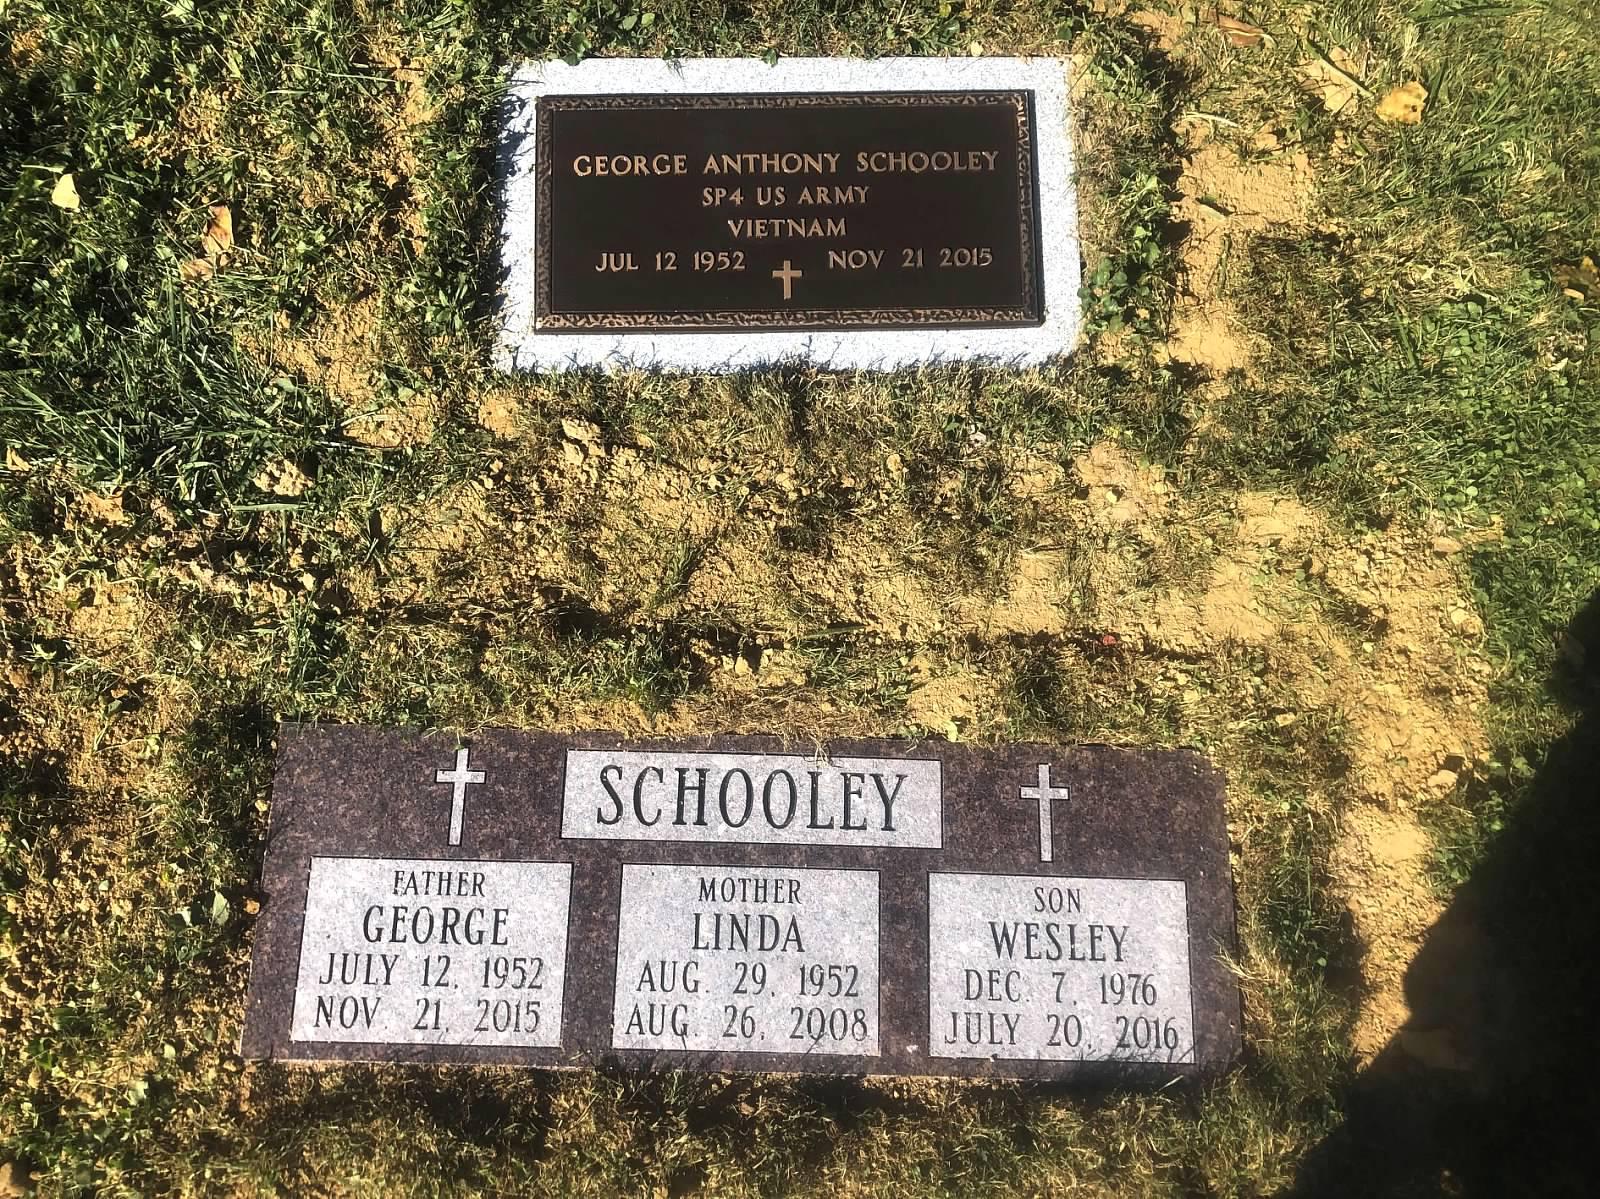 Schooley Bronze and Estate Markers